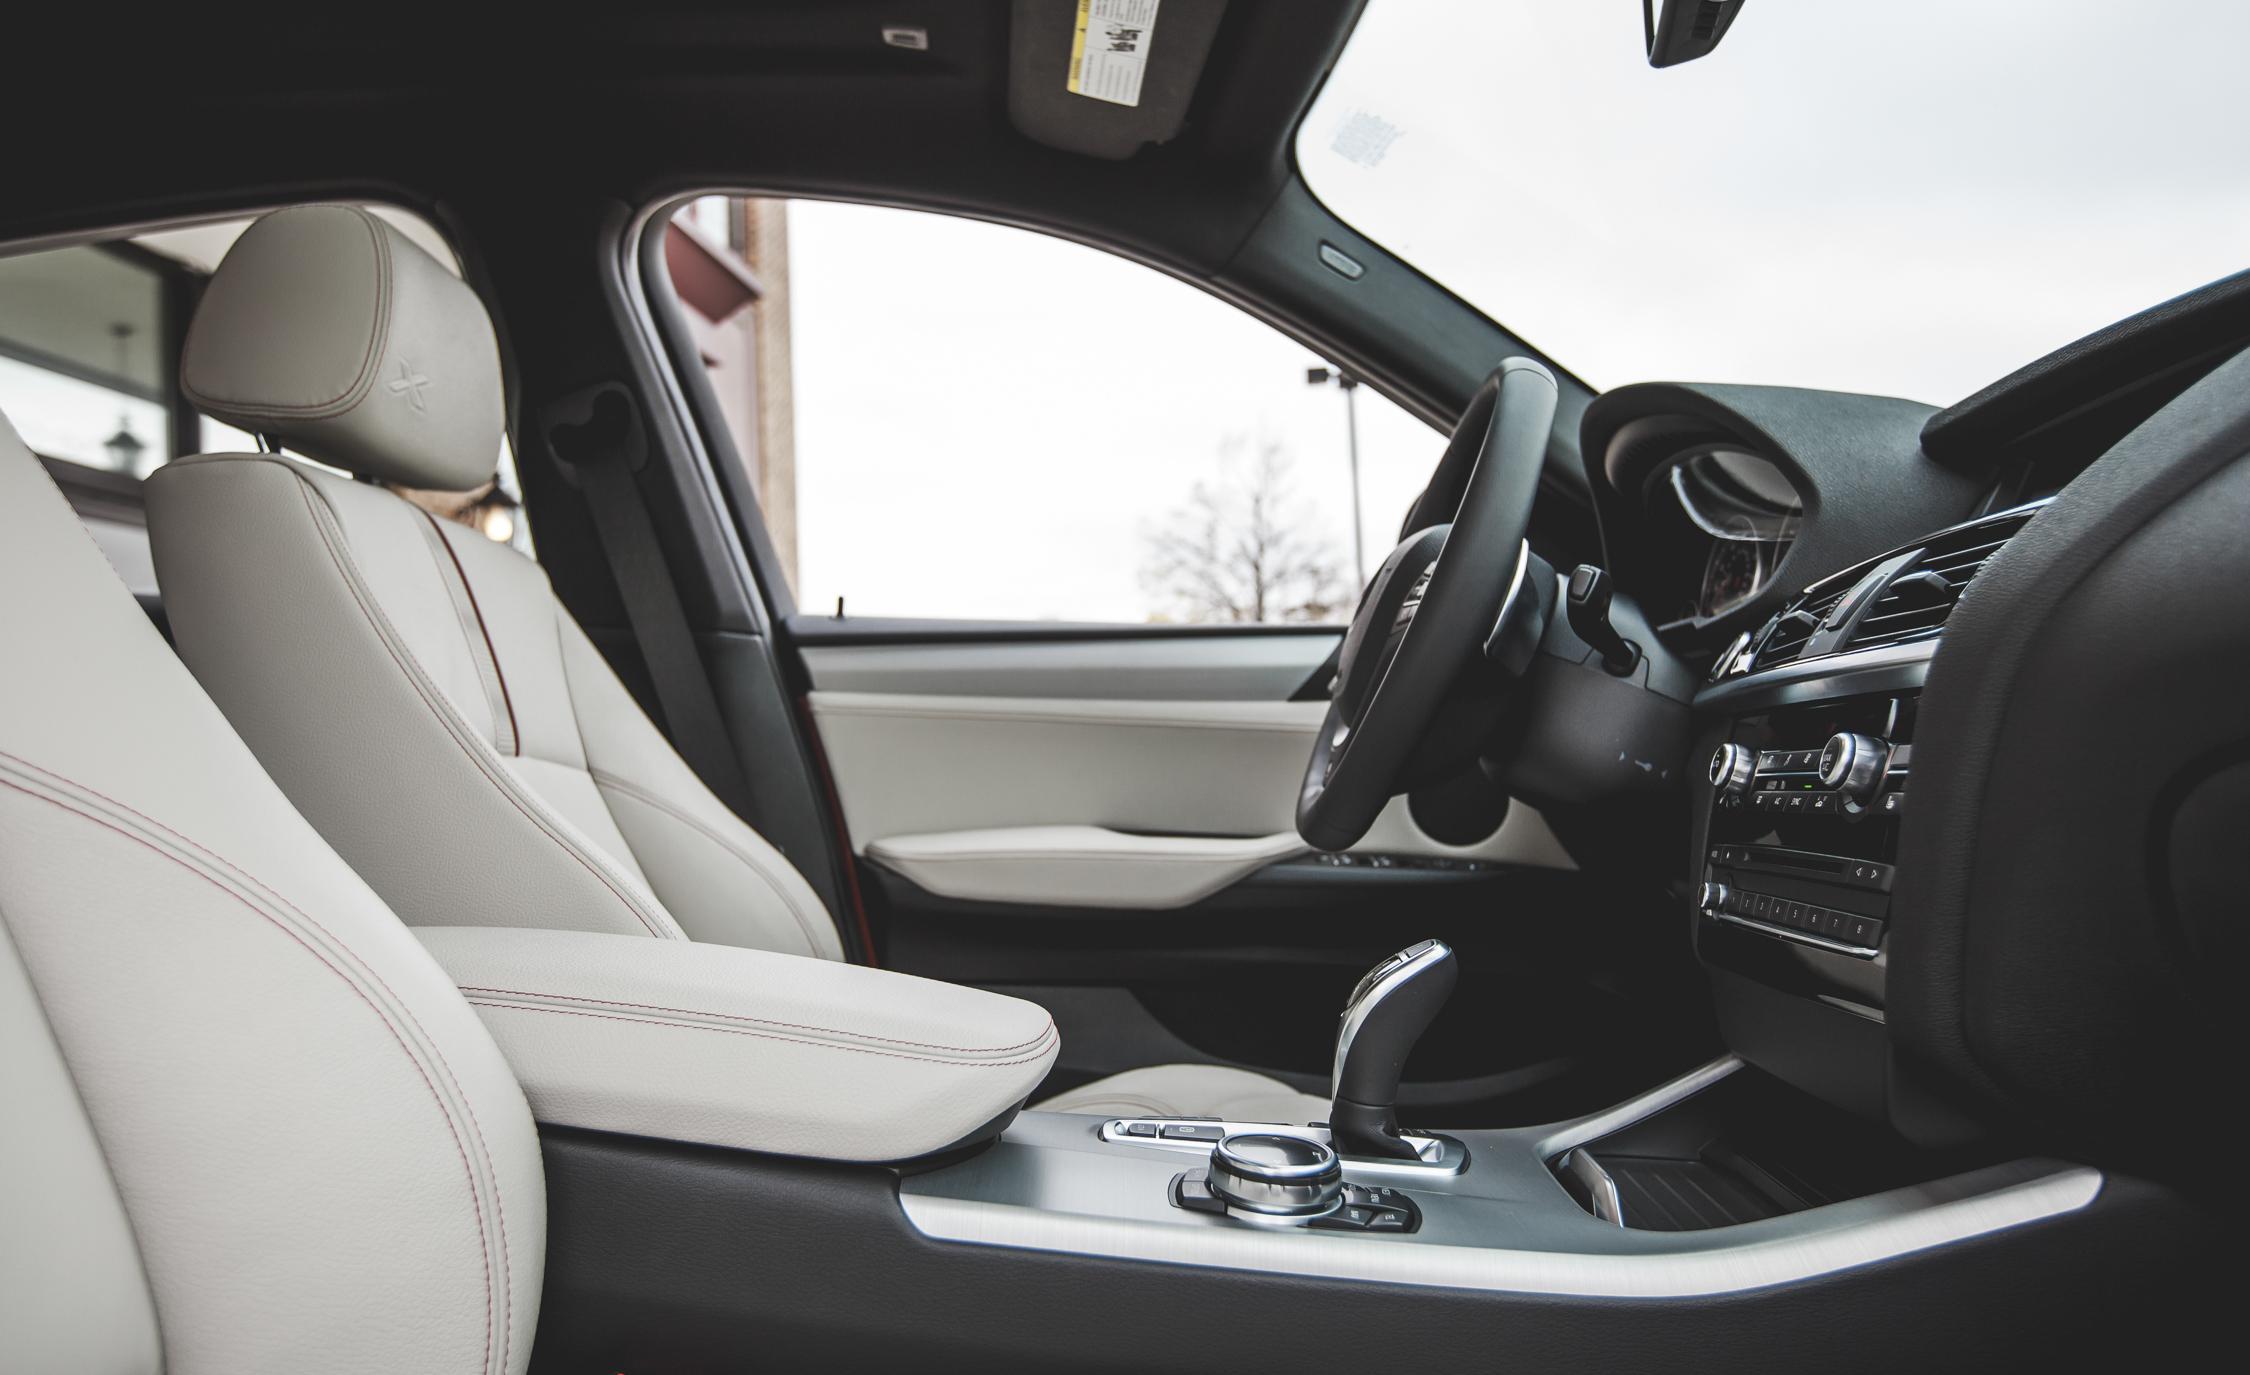 2015 BMW X4 XDrive28i Interior (Photo 5 of 29)